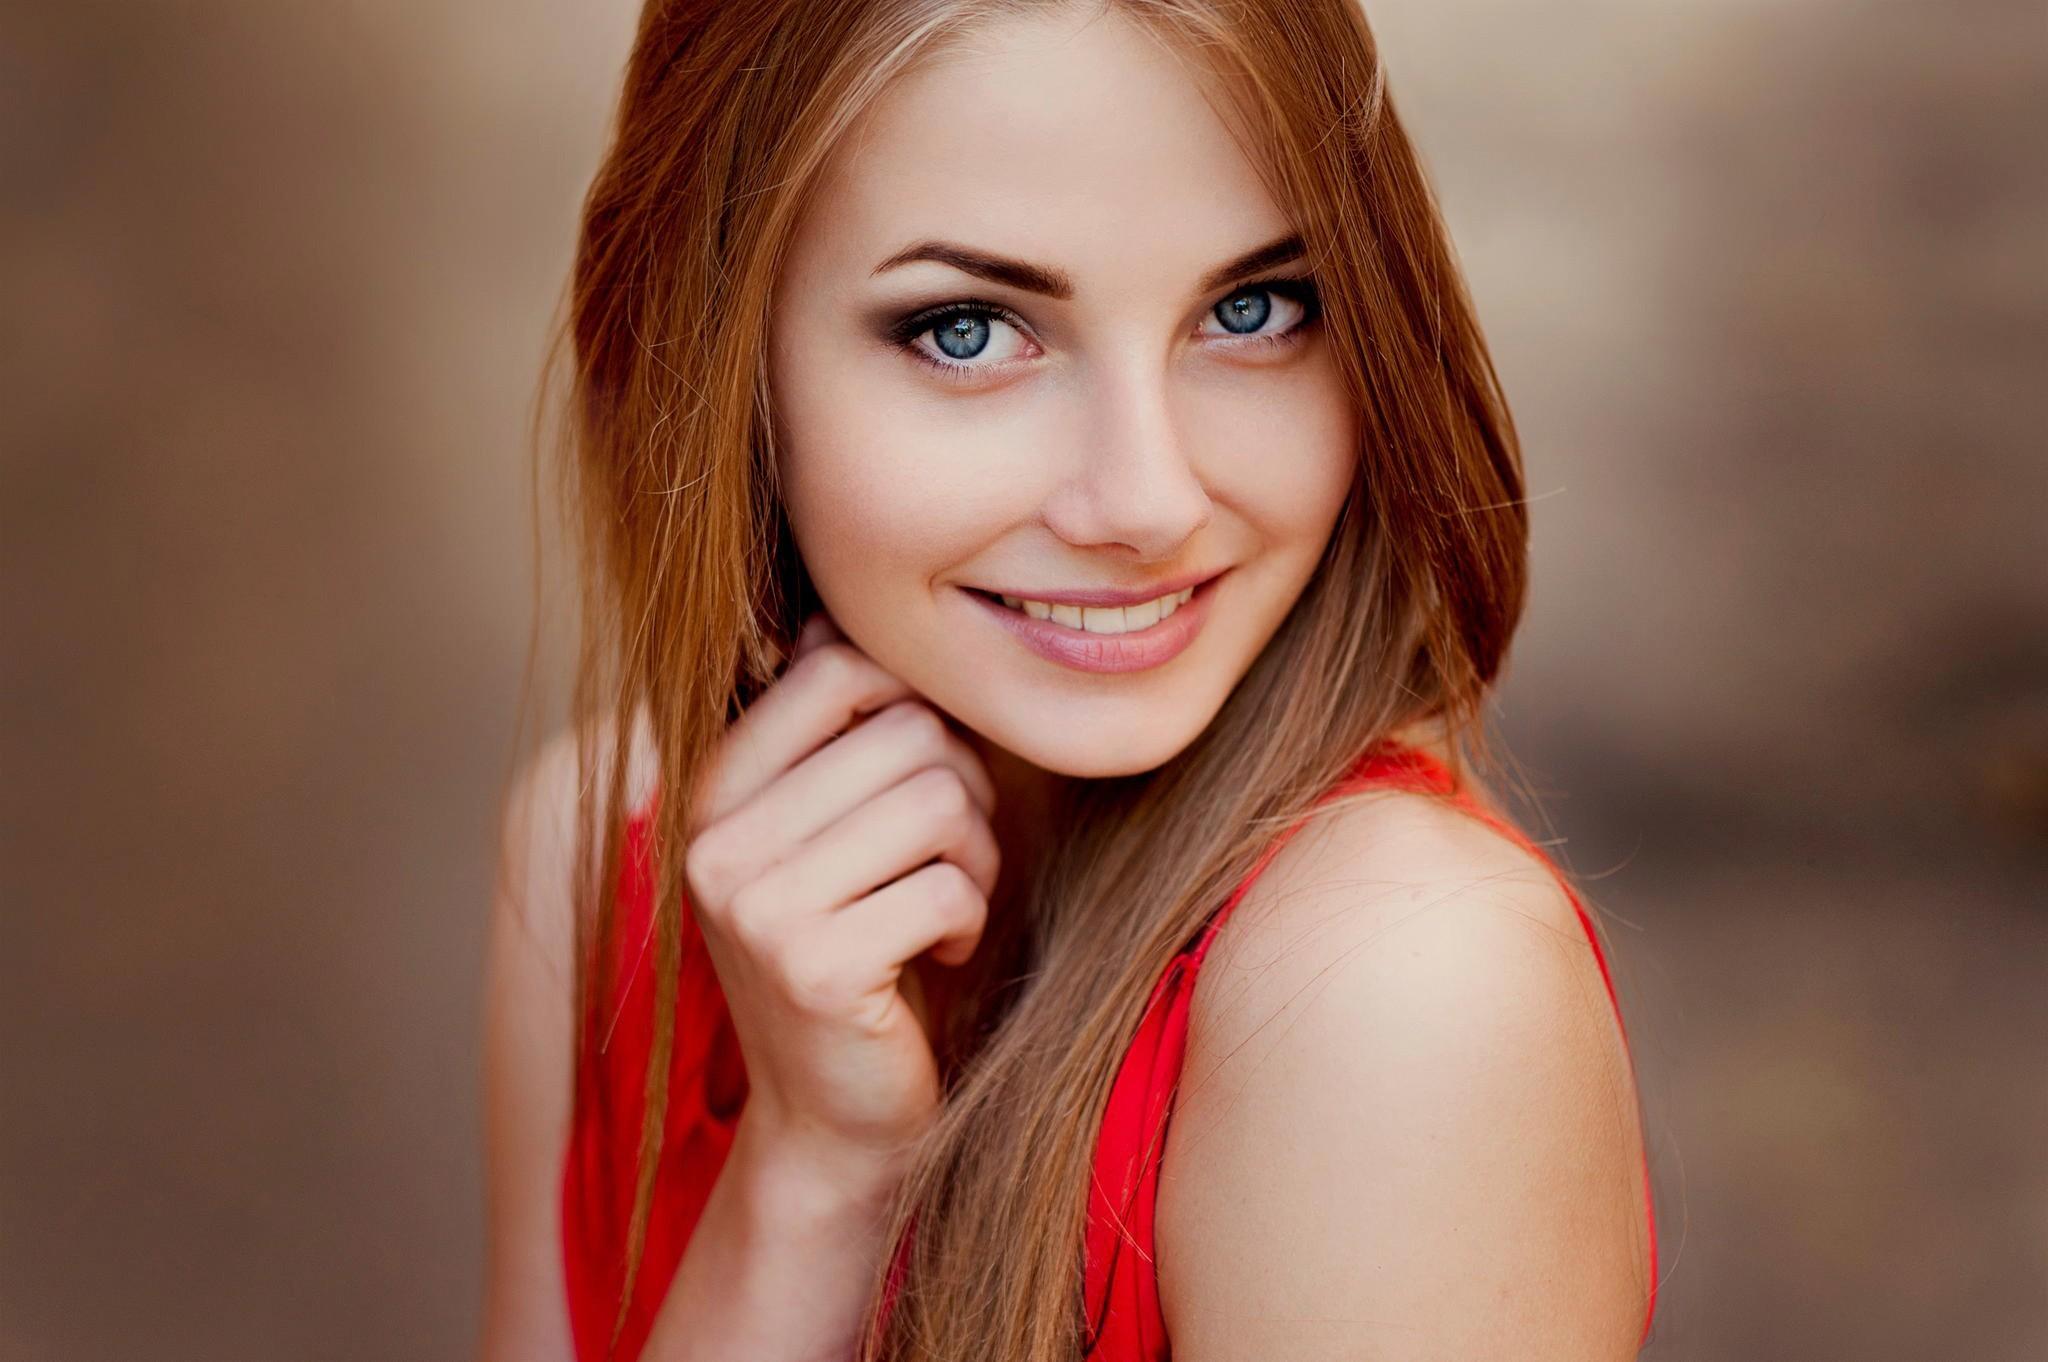 Blue eyes girl hd wallpaper free download